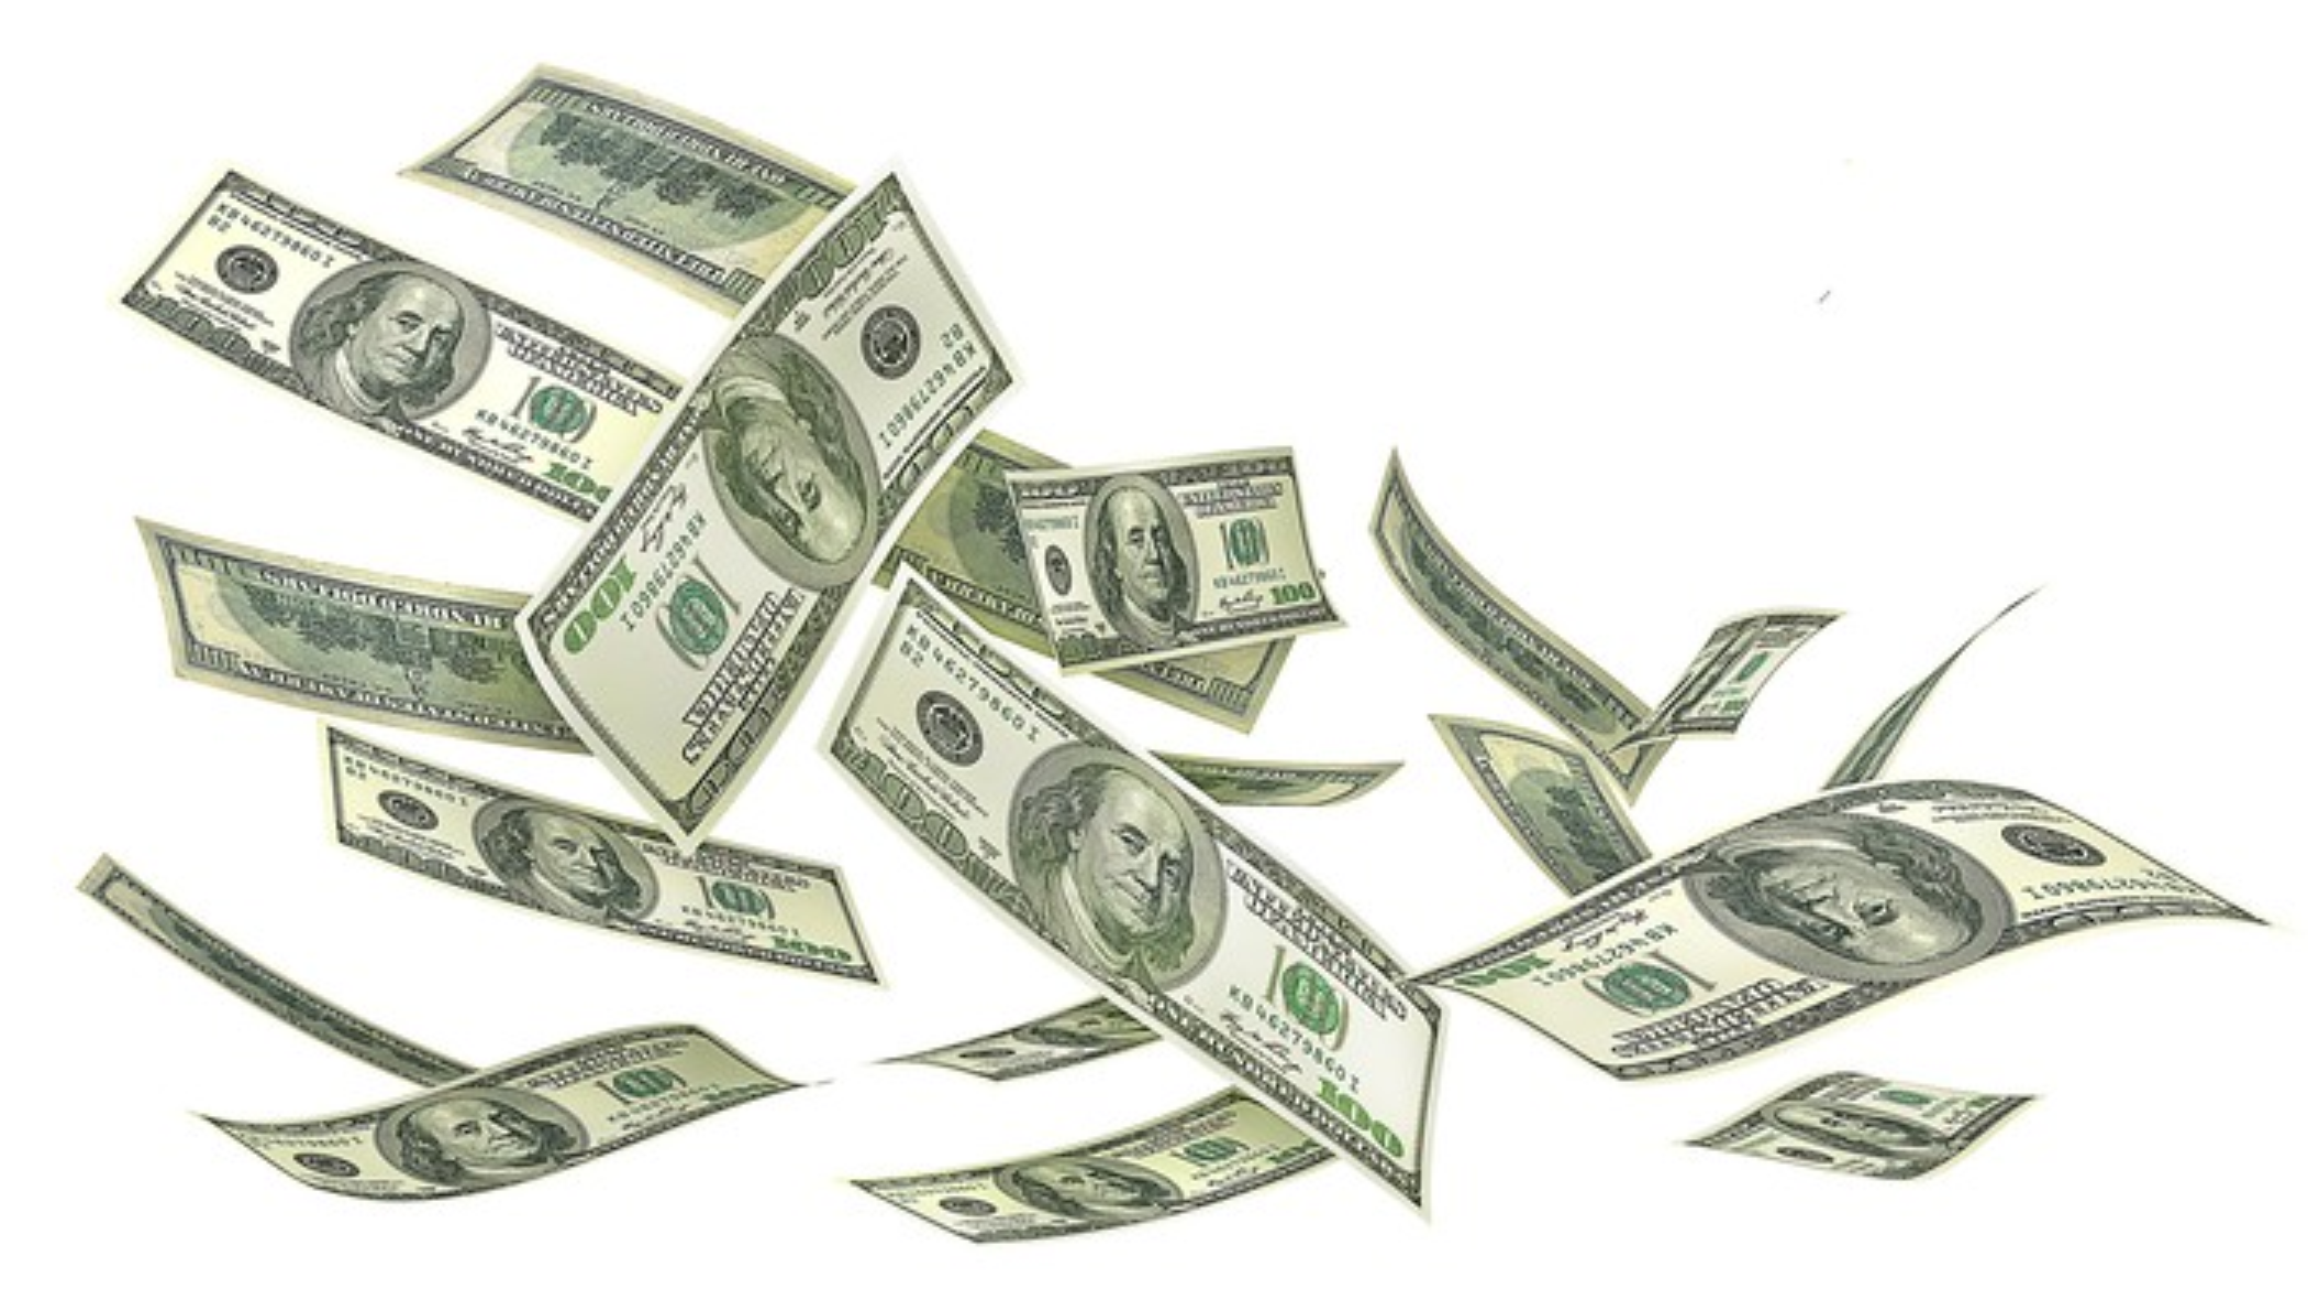 A handful of $100 bills falling through the air.